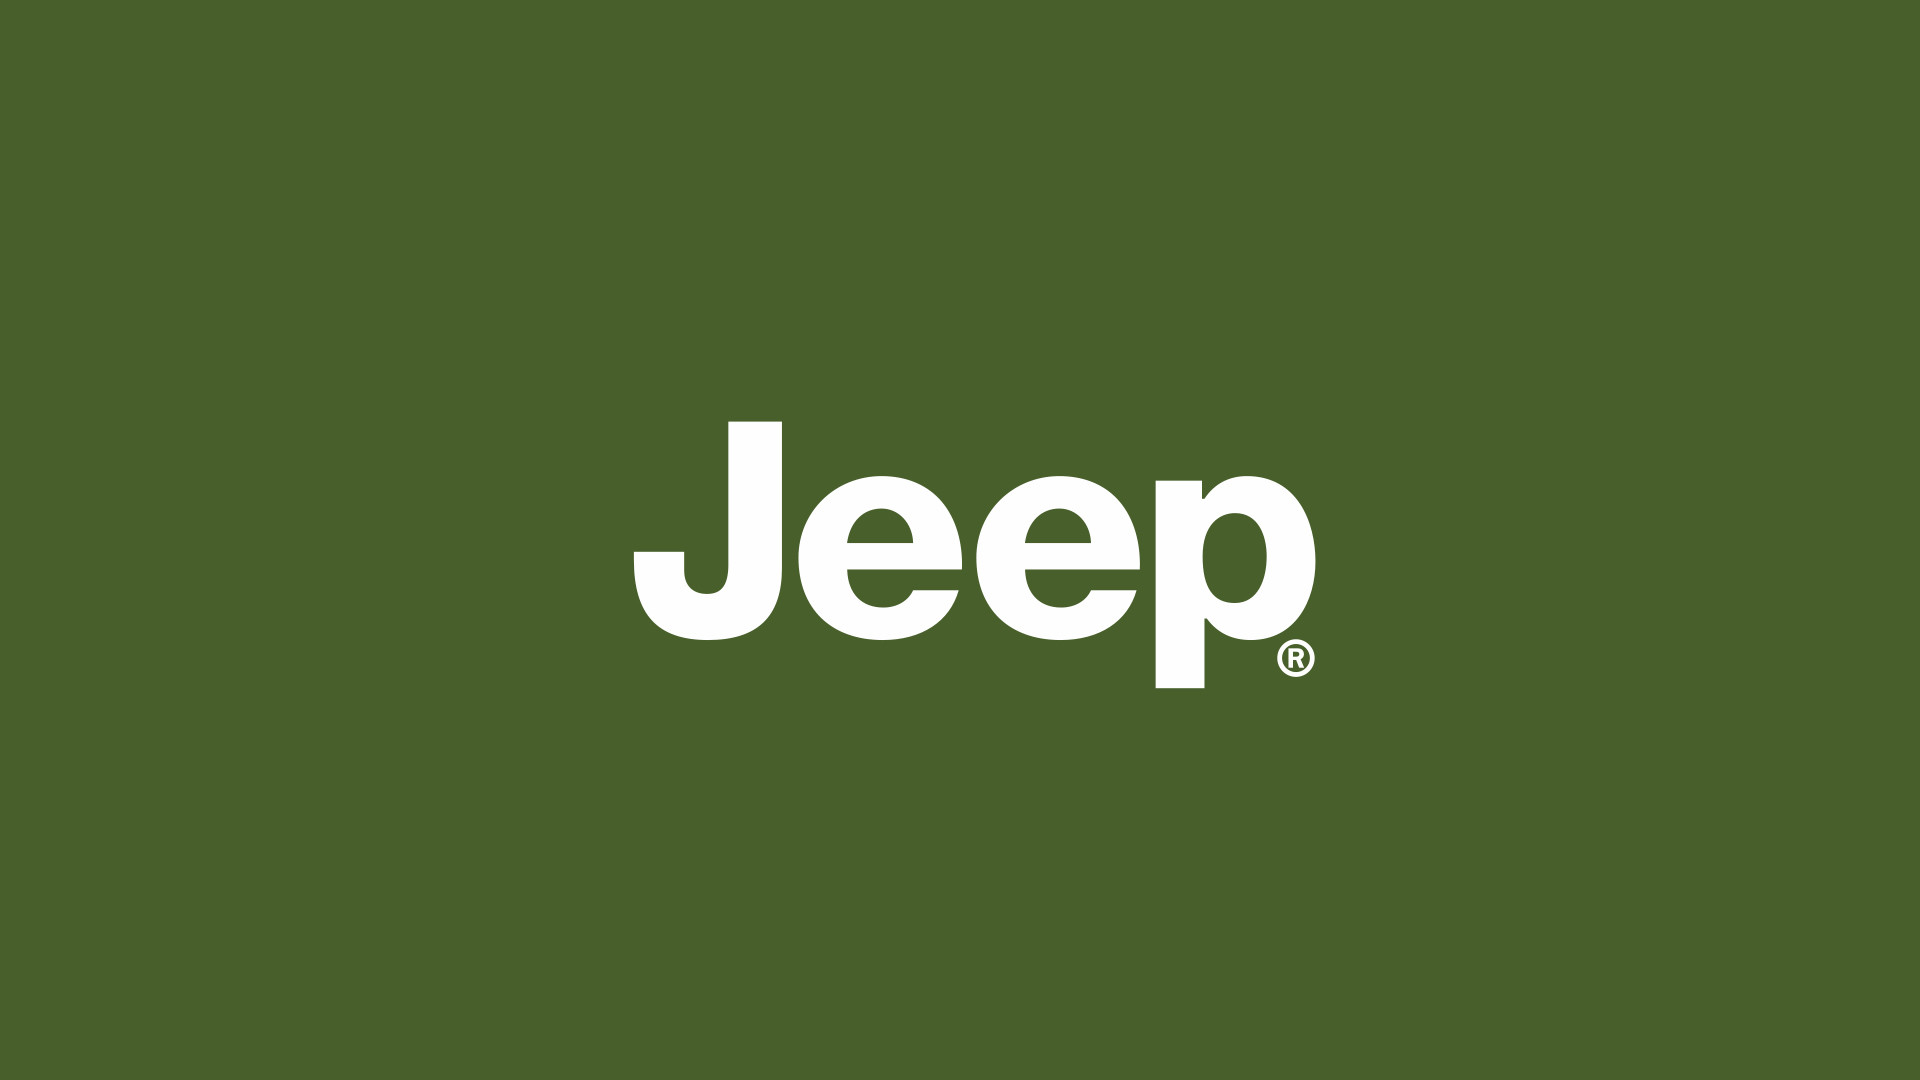 green jeep logo hd wallpaper 2428